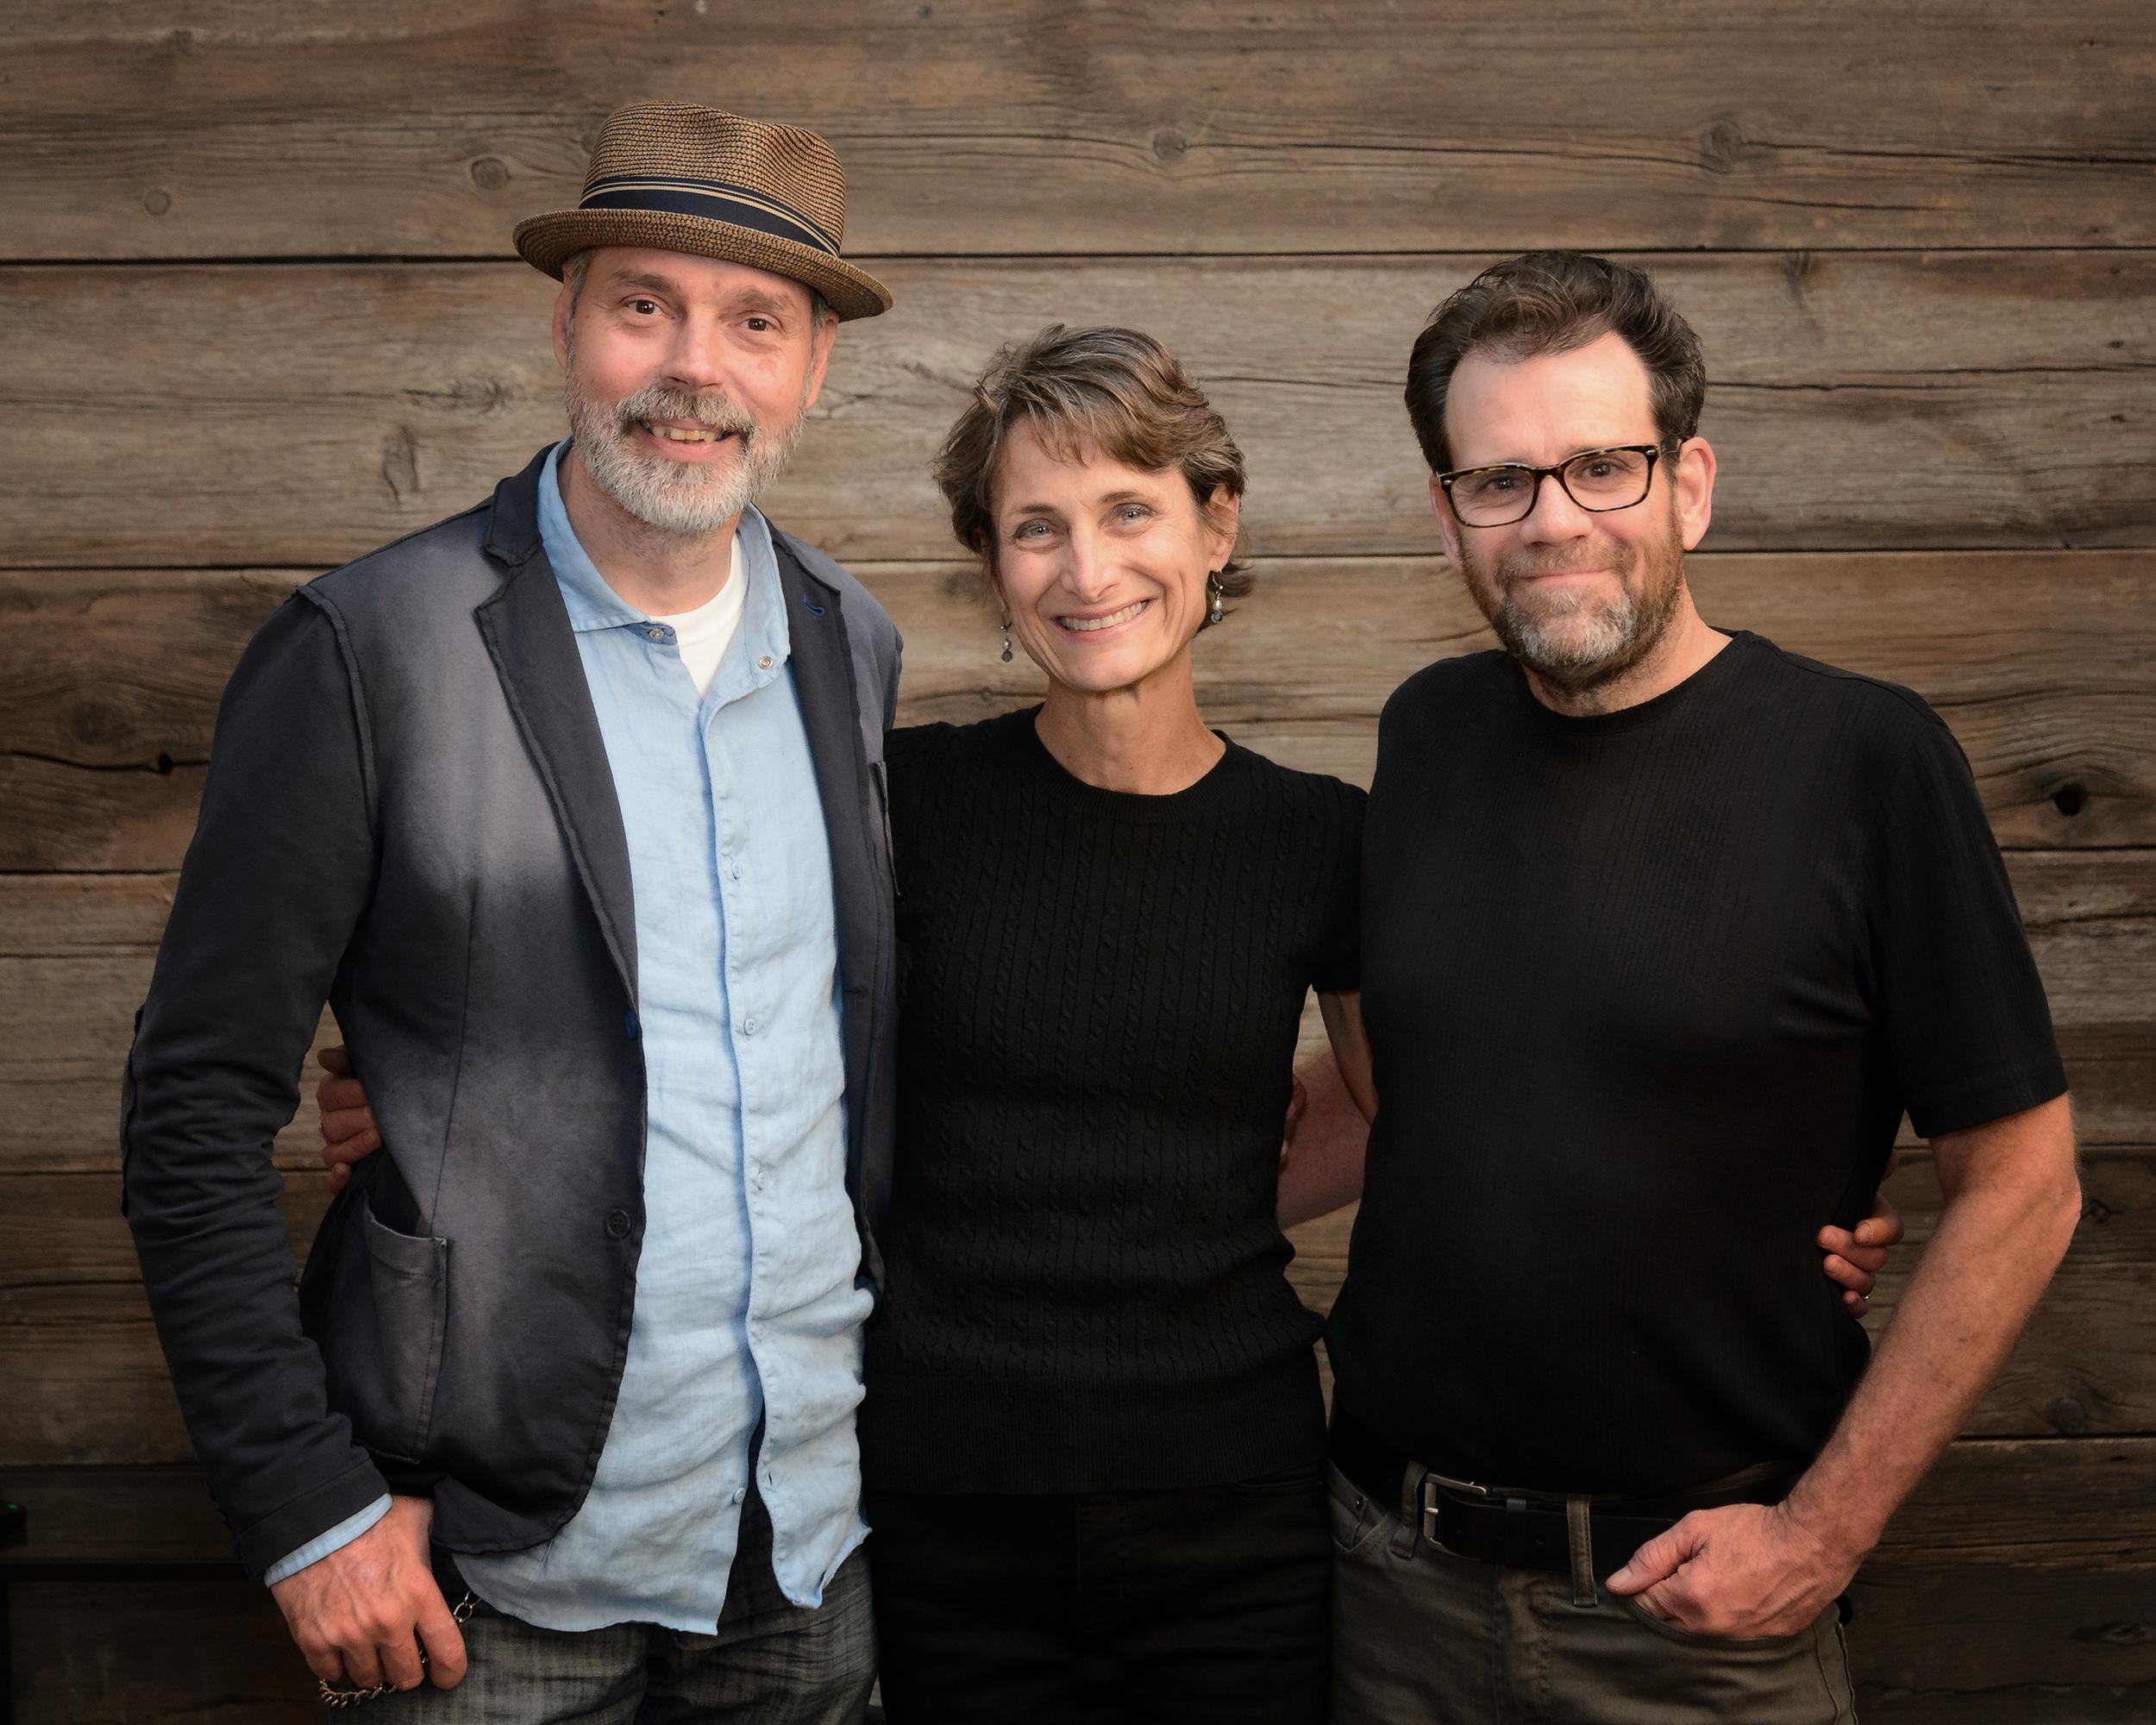 Authors Michael Karns, Lisa Golden Schroeder, and Dennis Becker (photo by Craig Mullenbach)